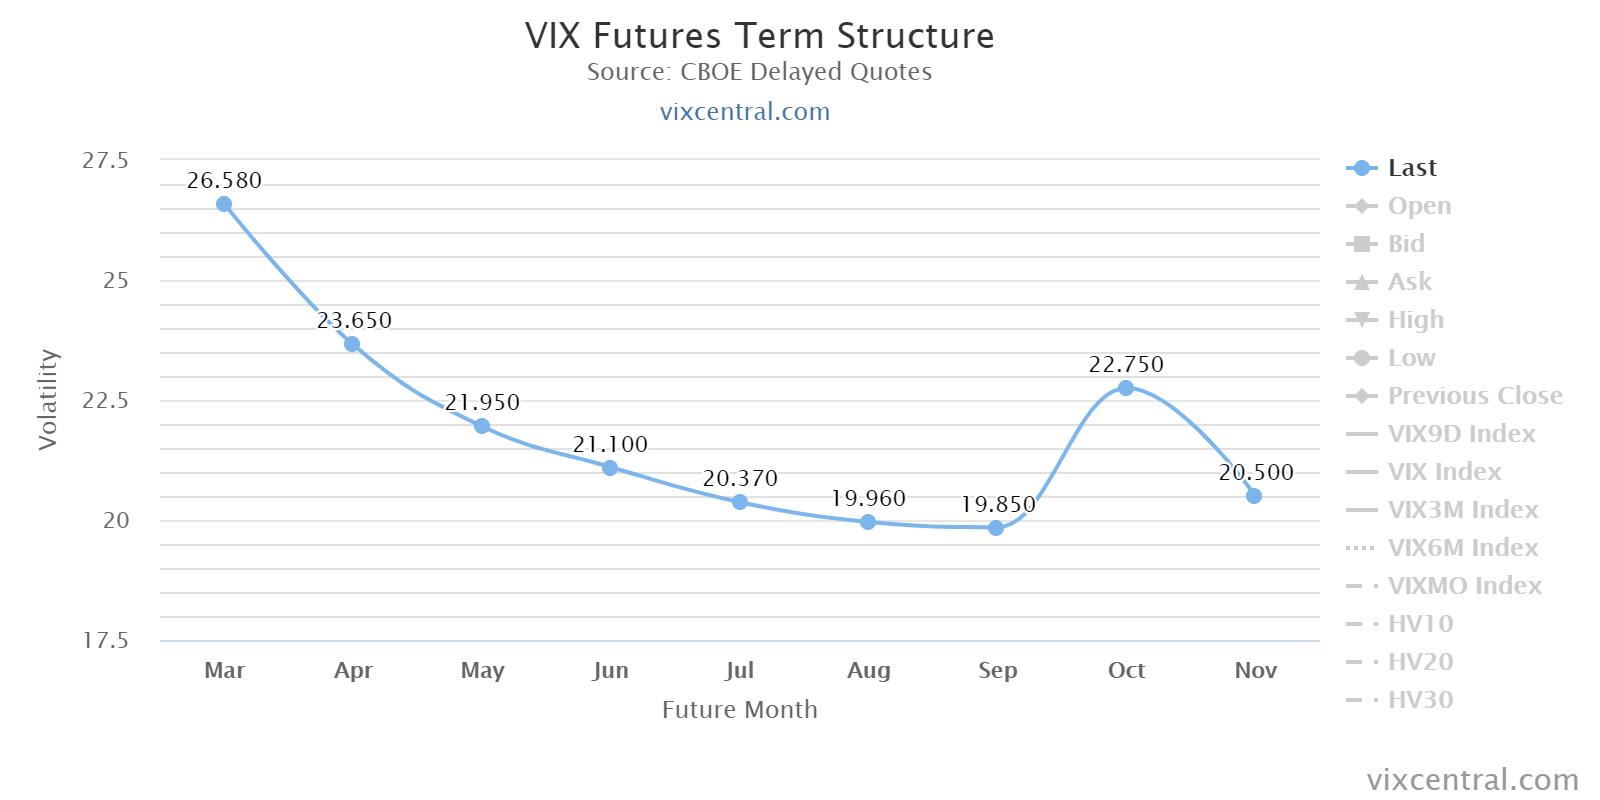 VIX Futures Term Structure